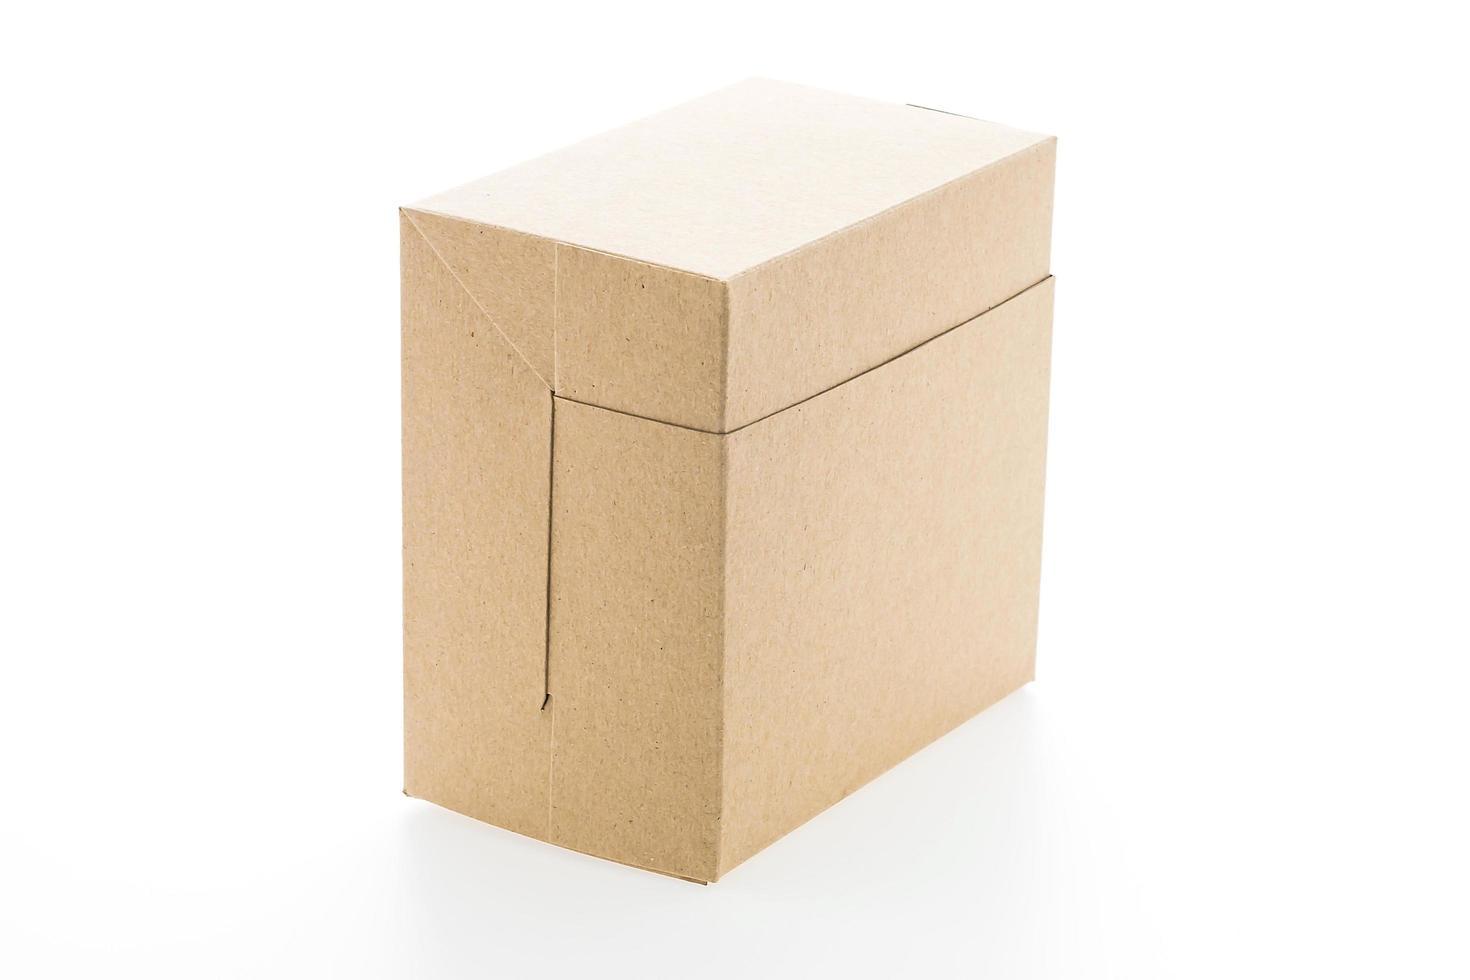 Brown paper box photo